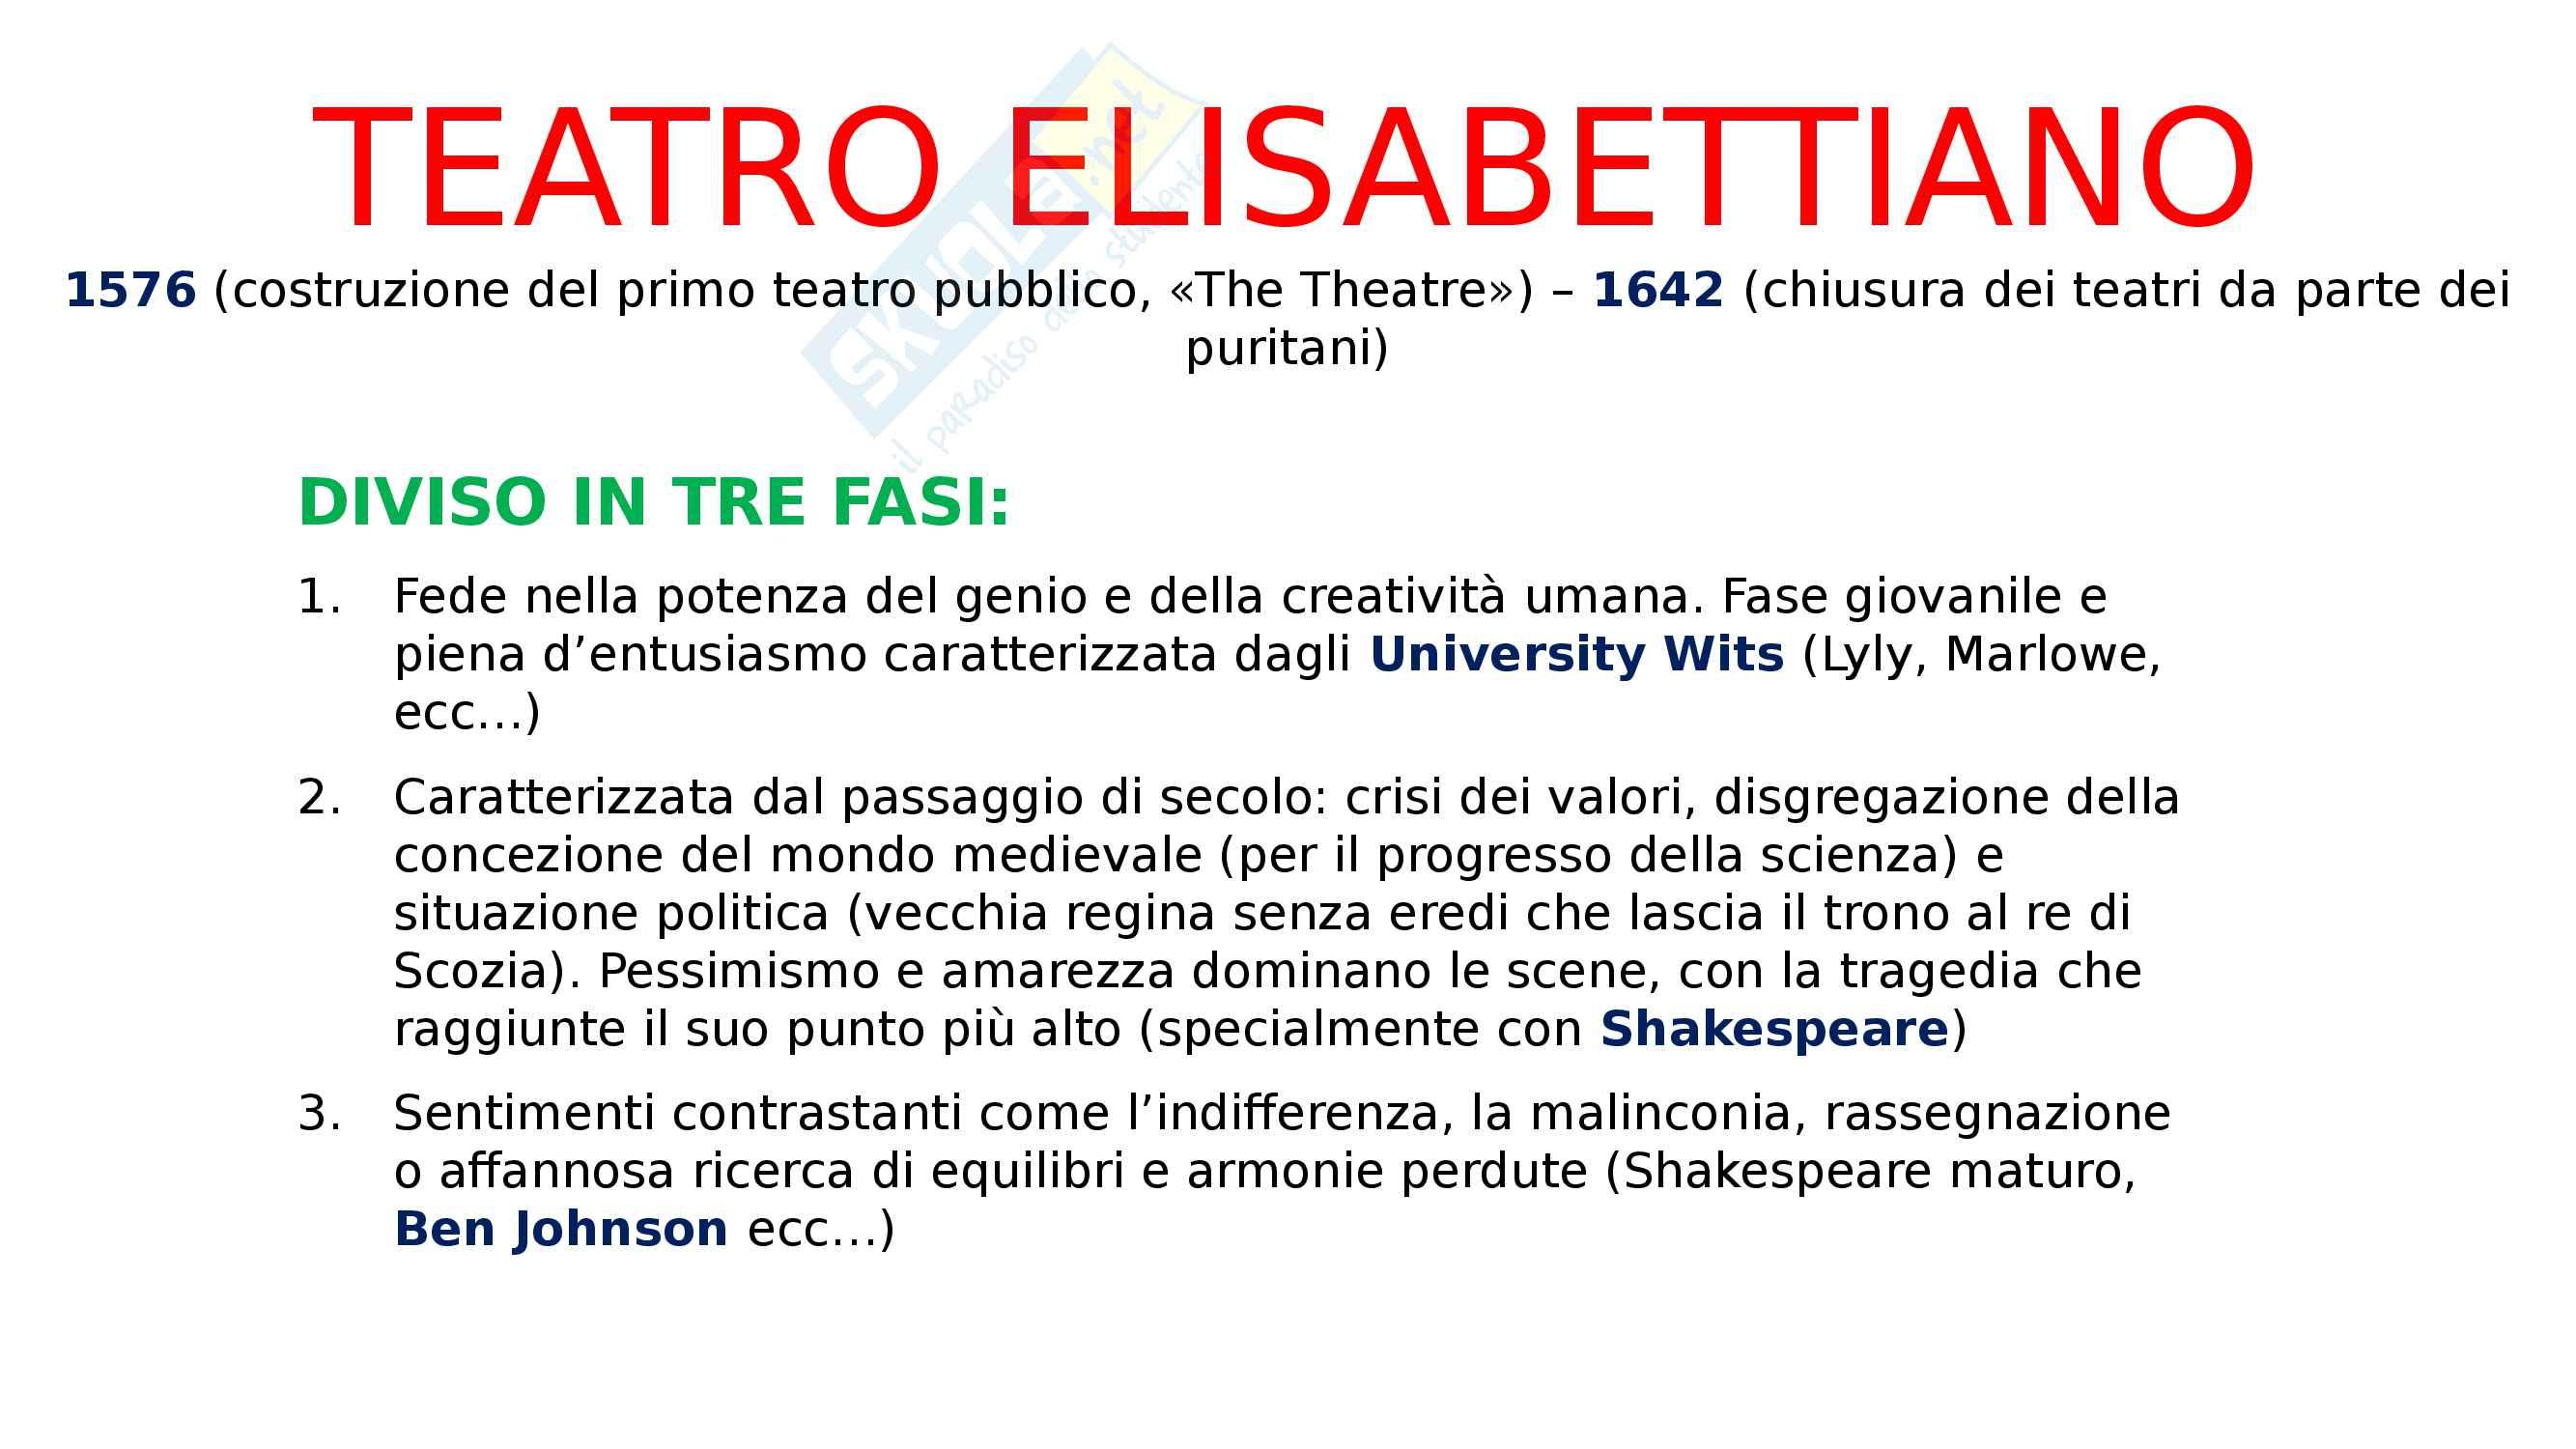 Teatro elisabettiano